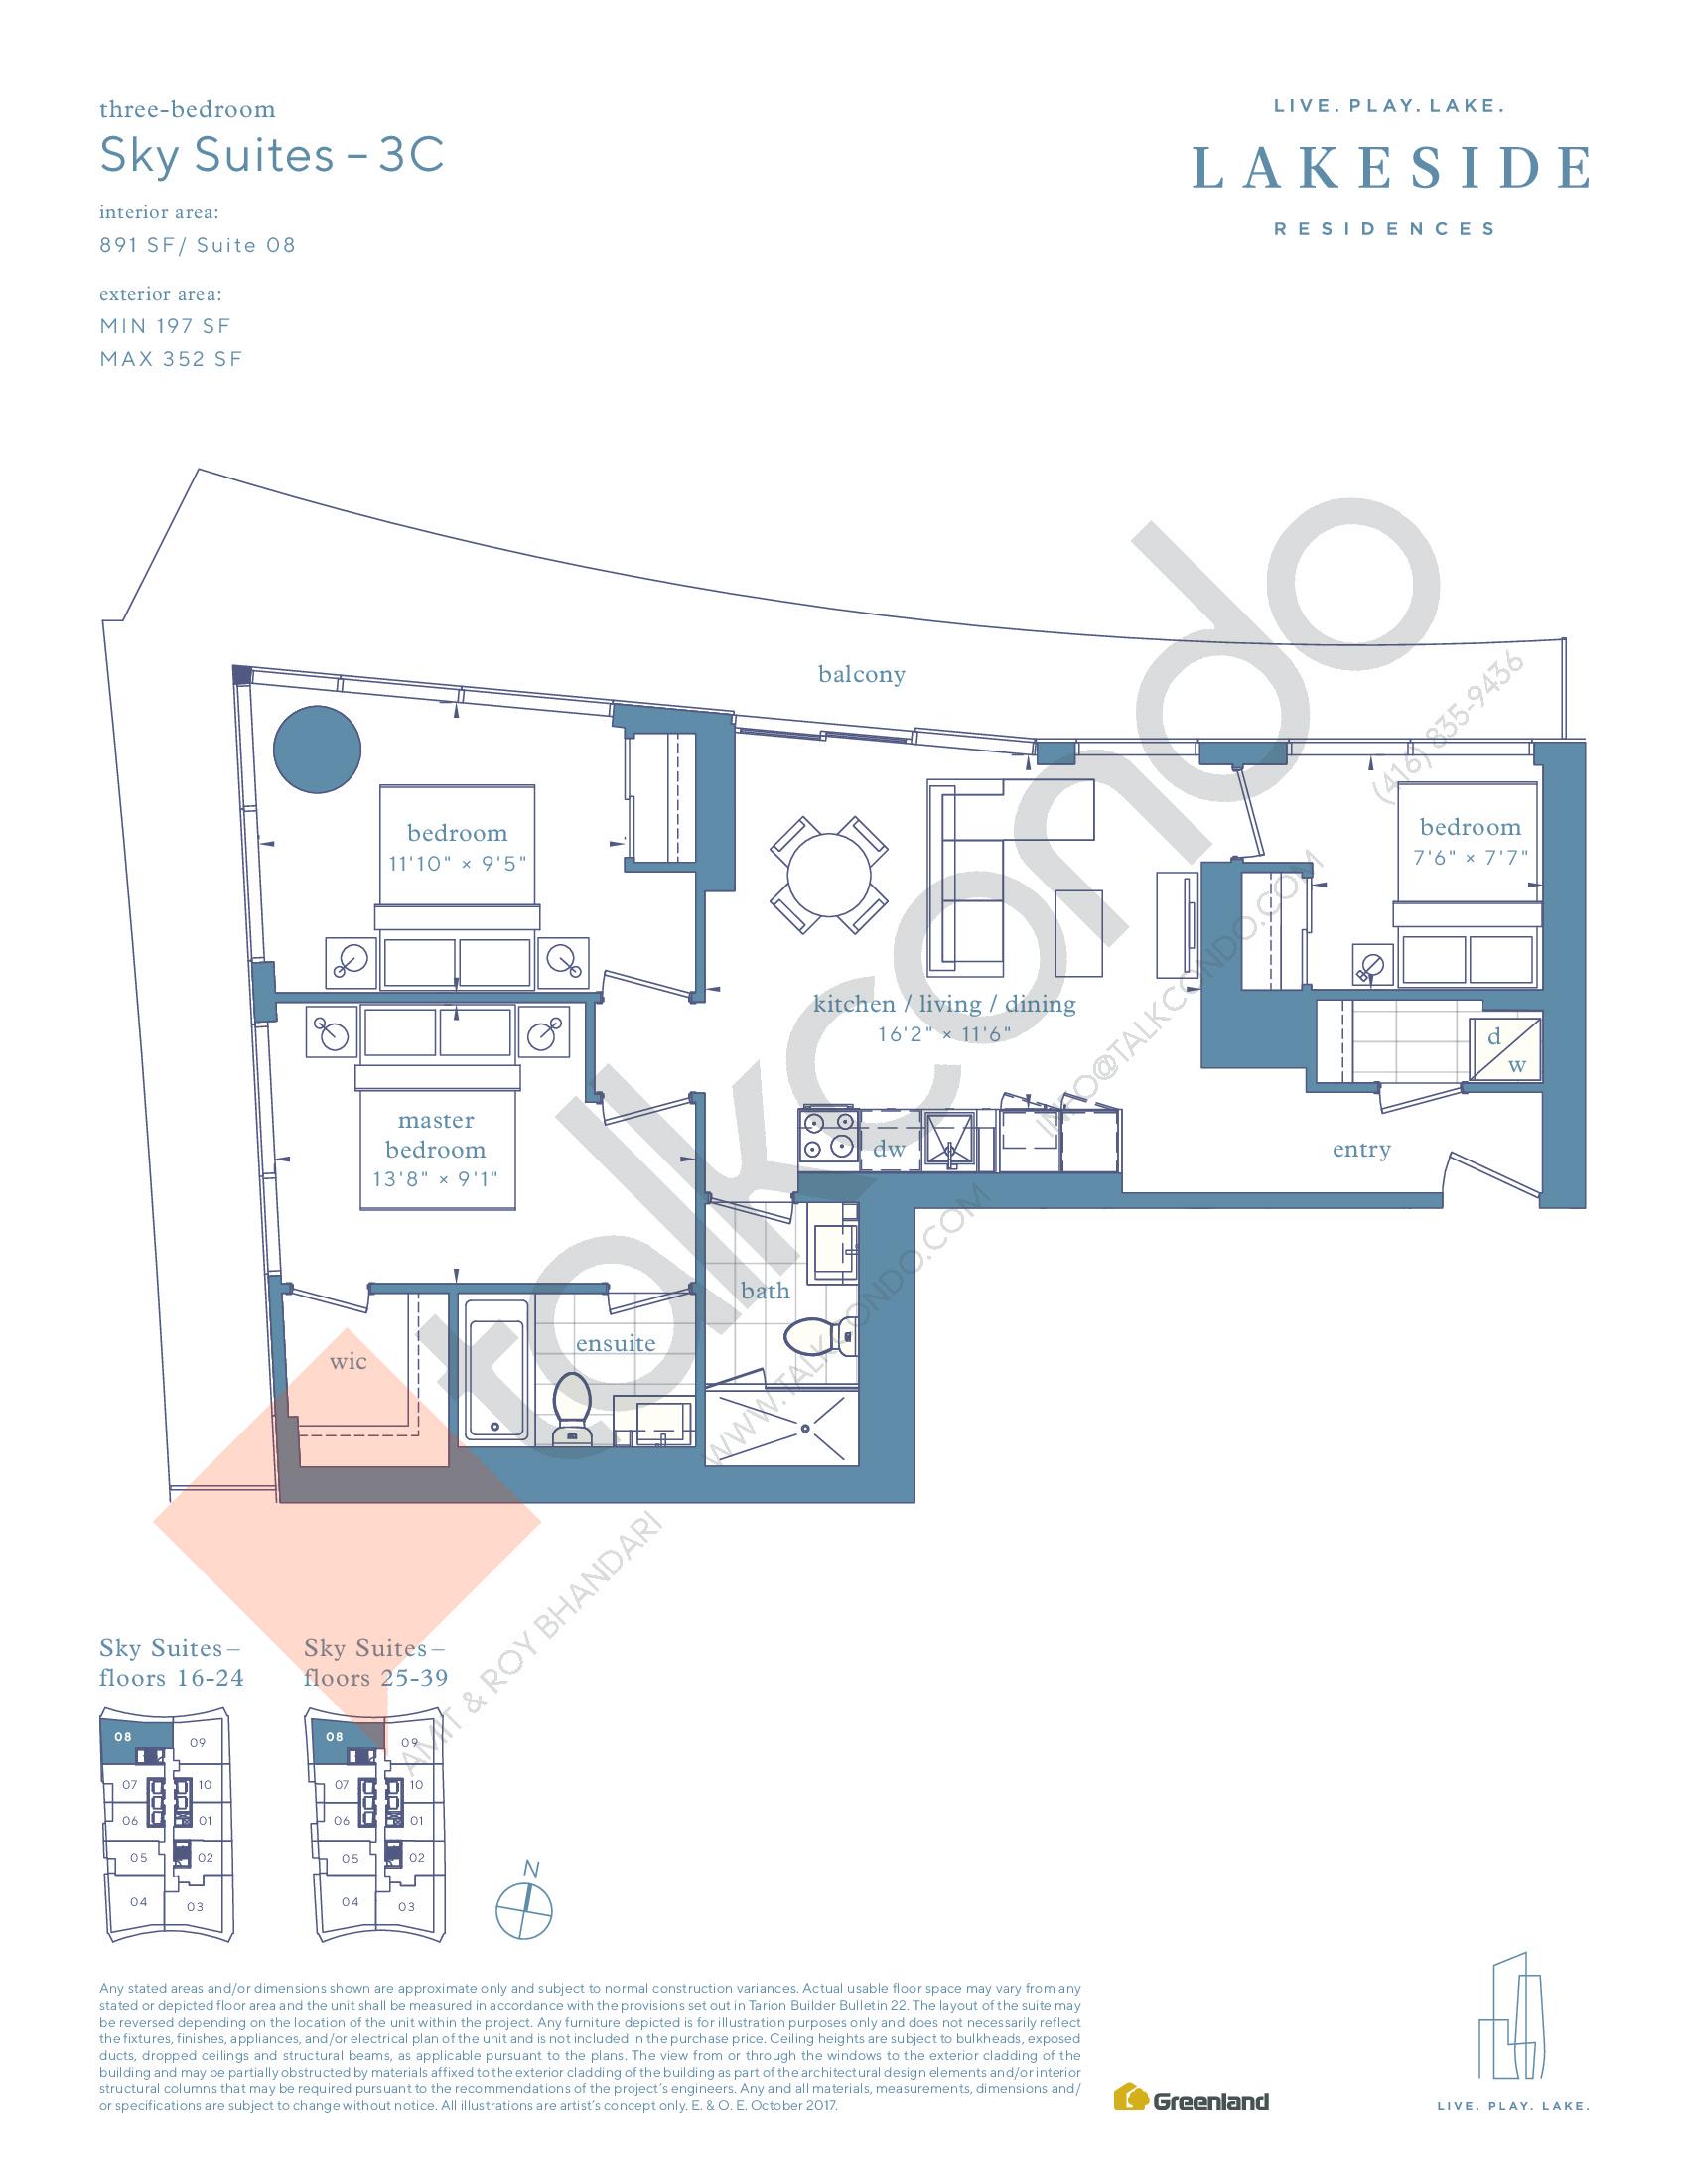 Sky Suites - 3C Floor Plan at Lakeside Residences - 891 sq.ft